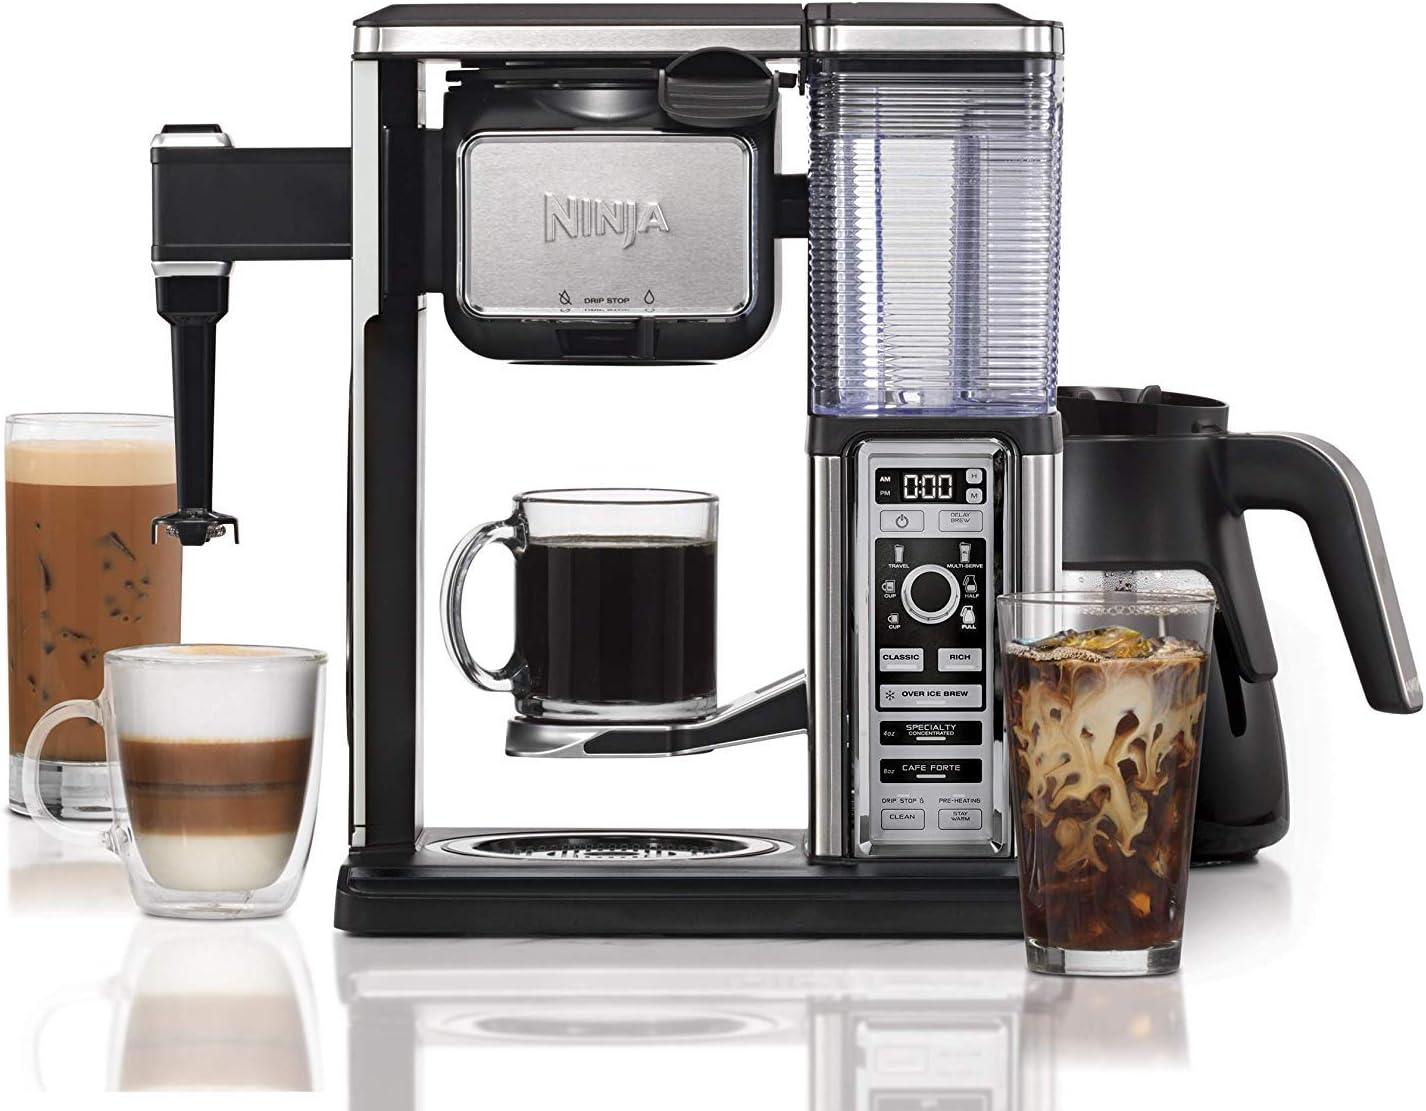 B077SDTCD5 Ninja CF091 Coffee Bar, Black/Silver (Renewed) 71XRoqfCf9L.SL1500_